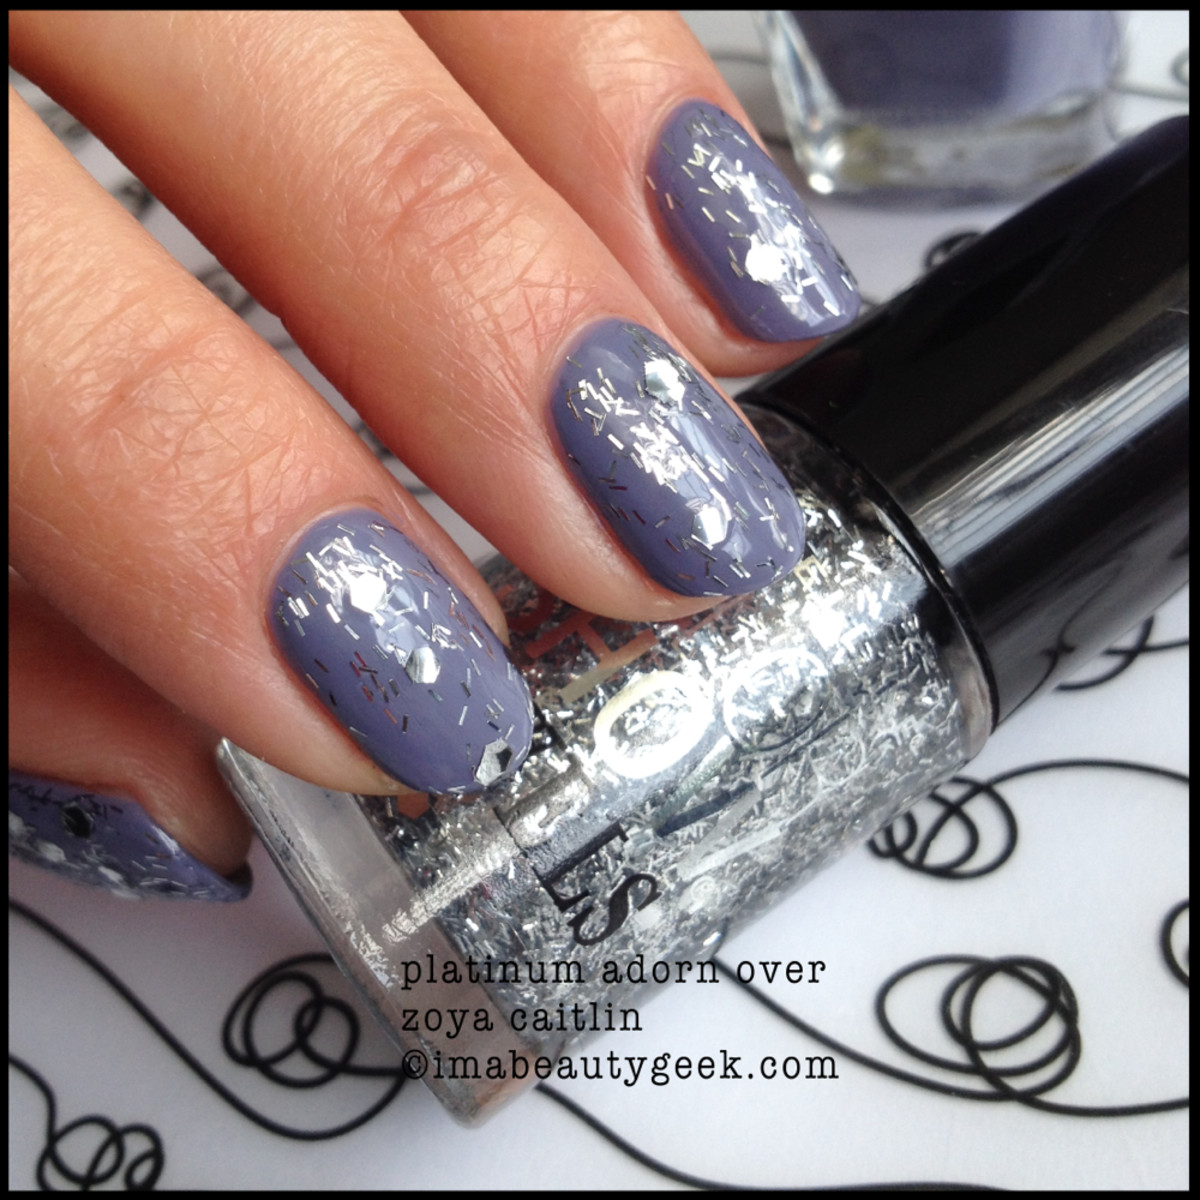 Maybelline Platinum Adorn Jewels